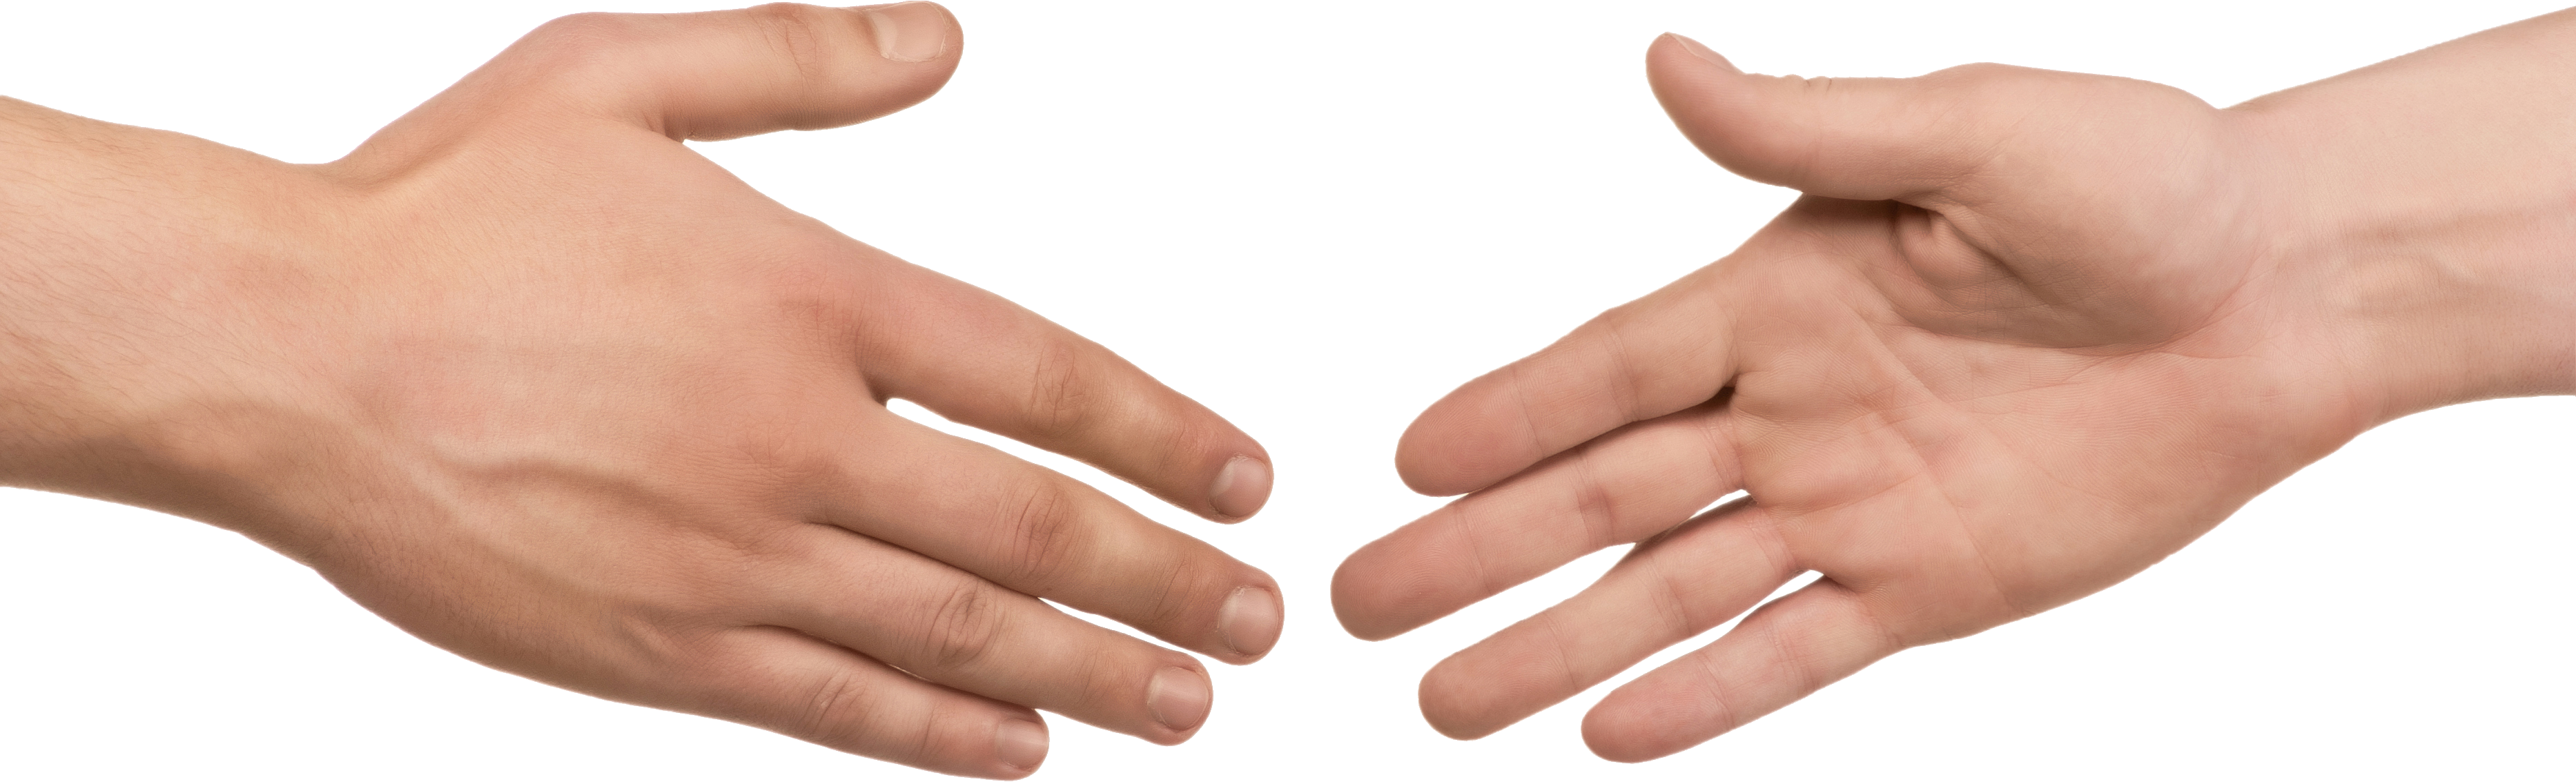 Handshake PNG HD - 129422